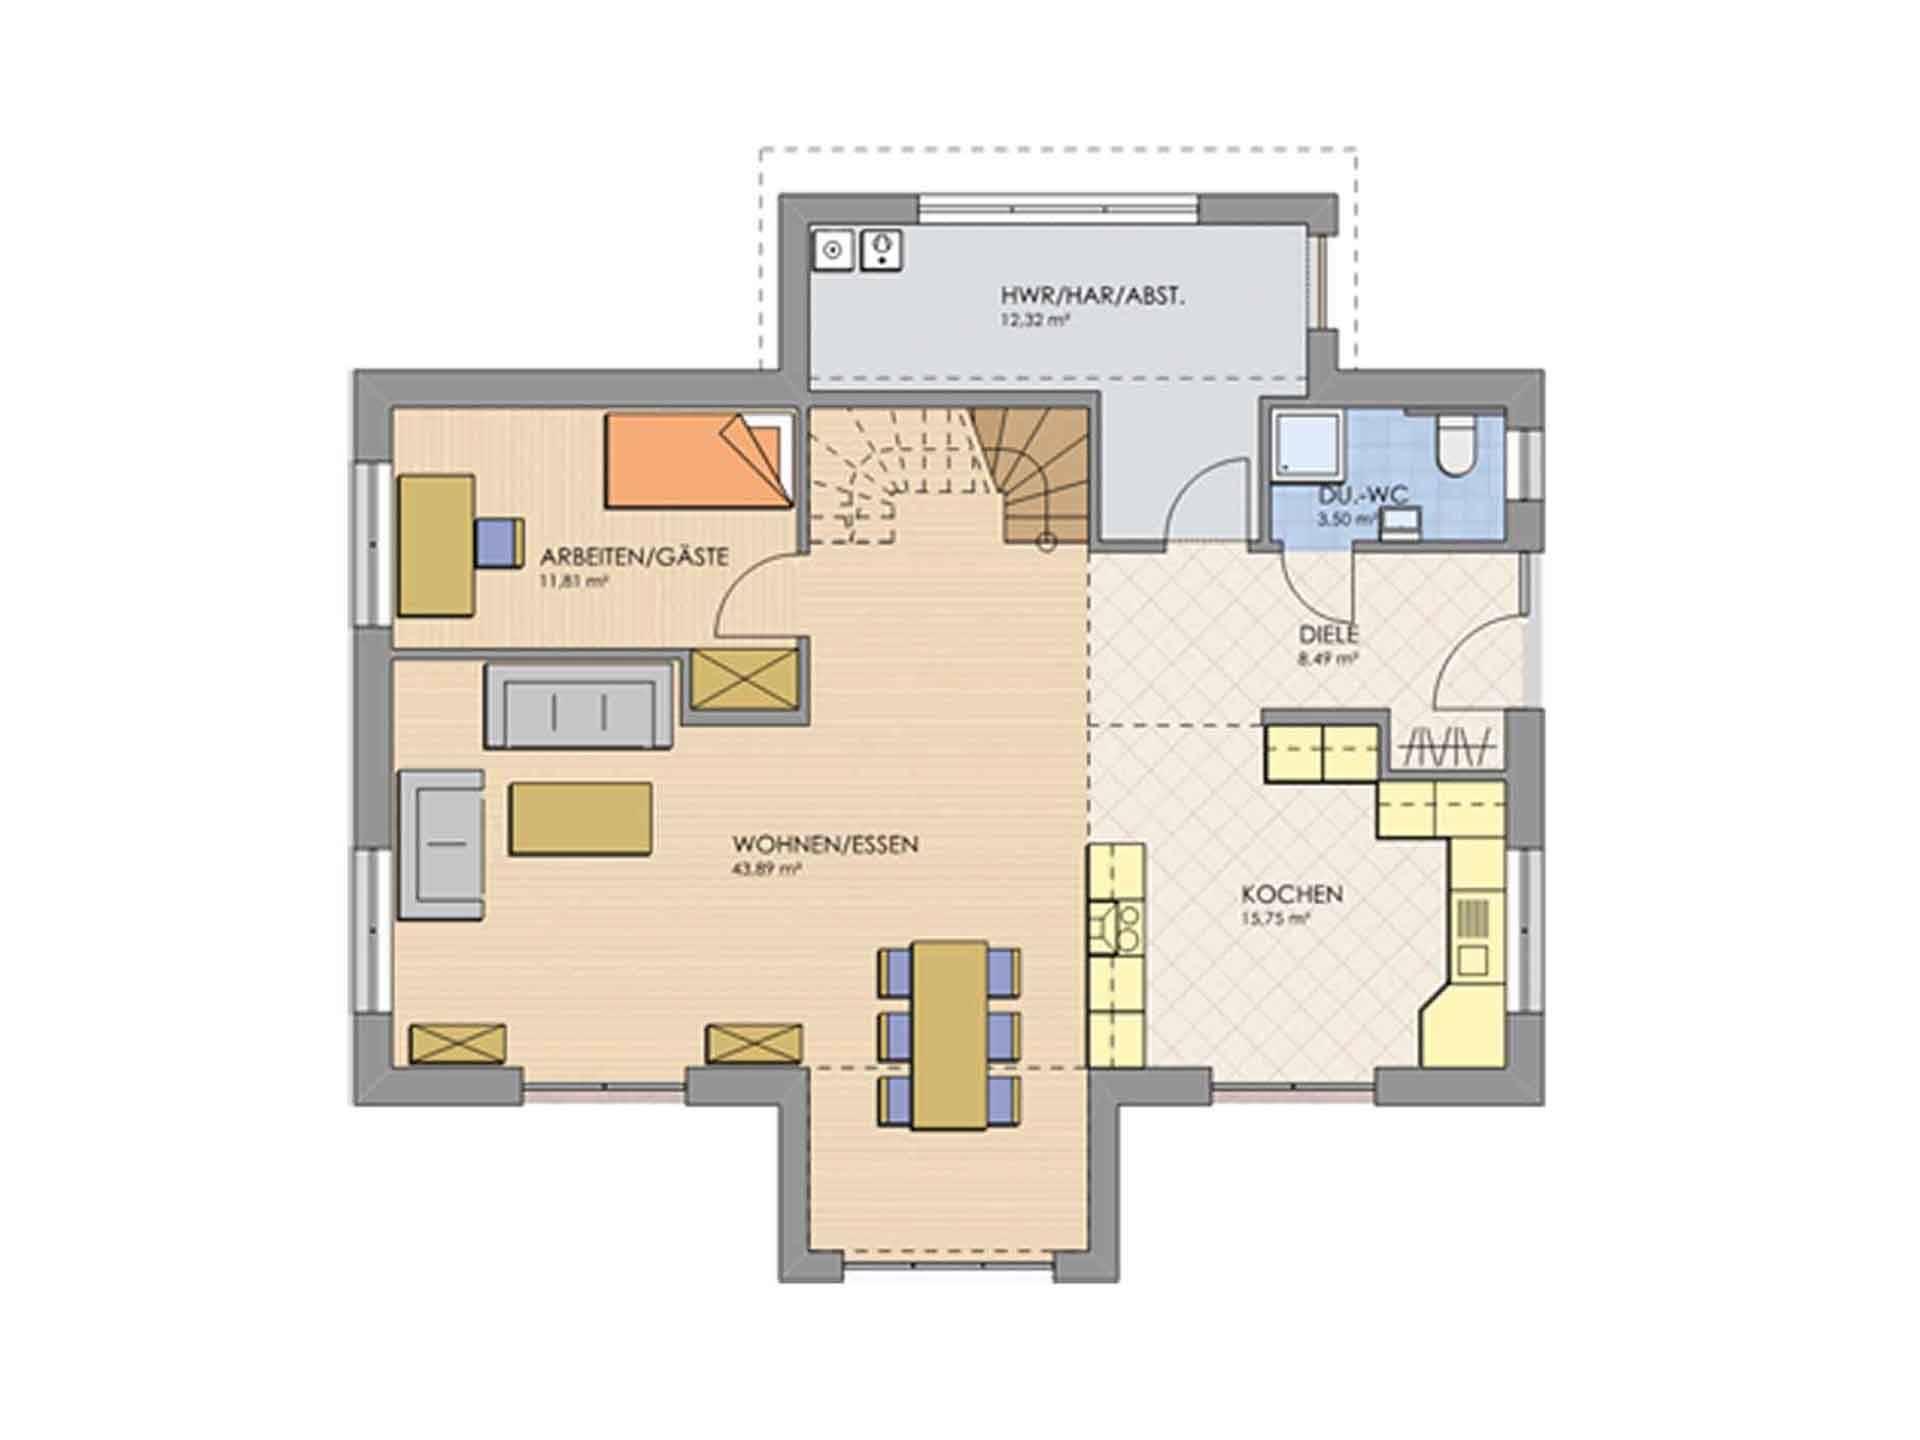 Grundriss Erdgeschoss Haus MODERN 168 von AP:art Haus GmbH